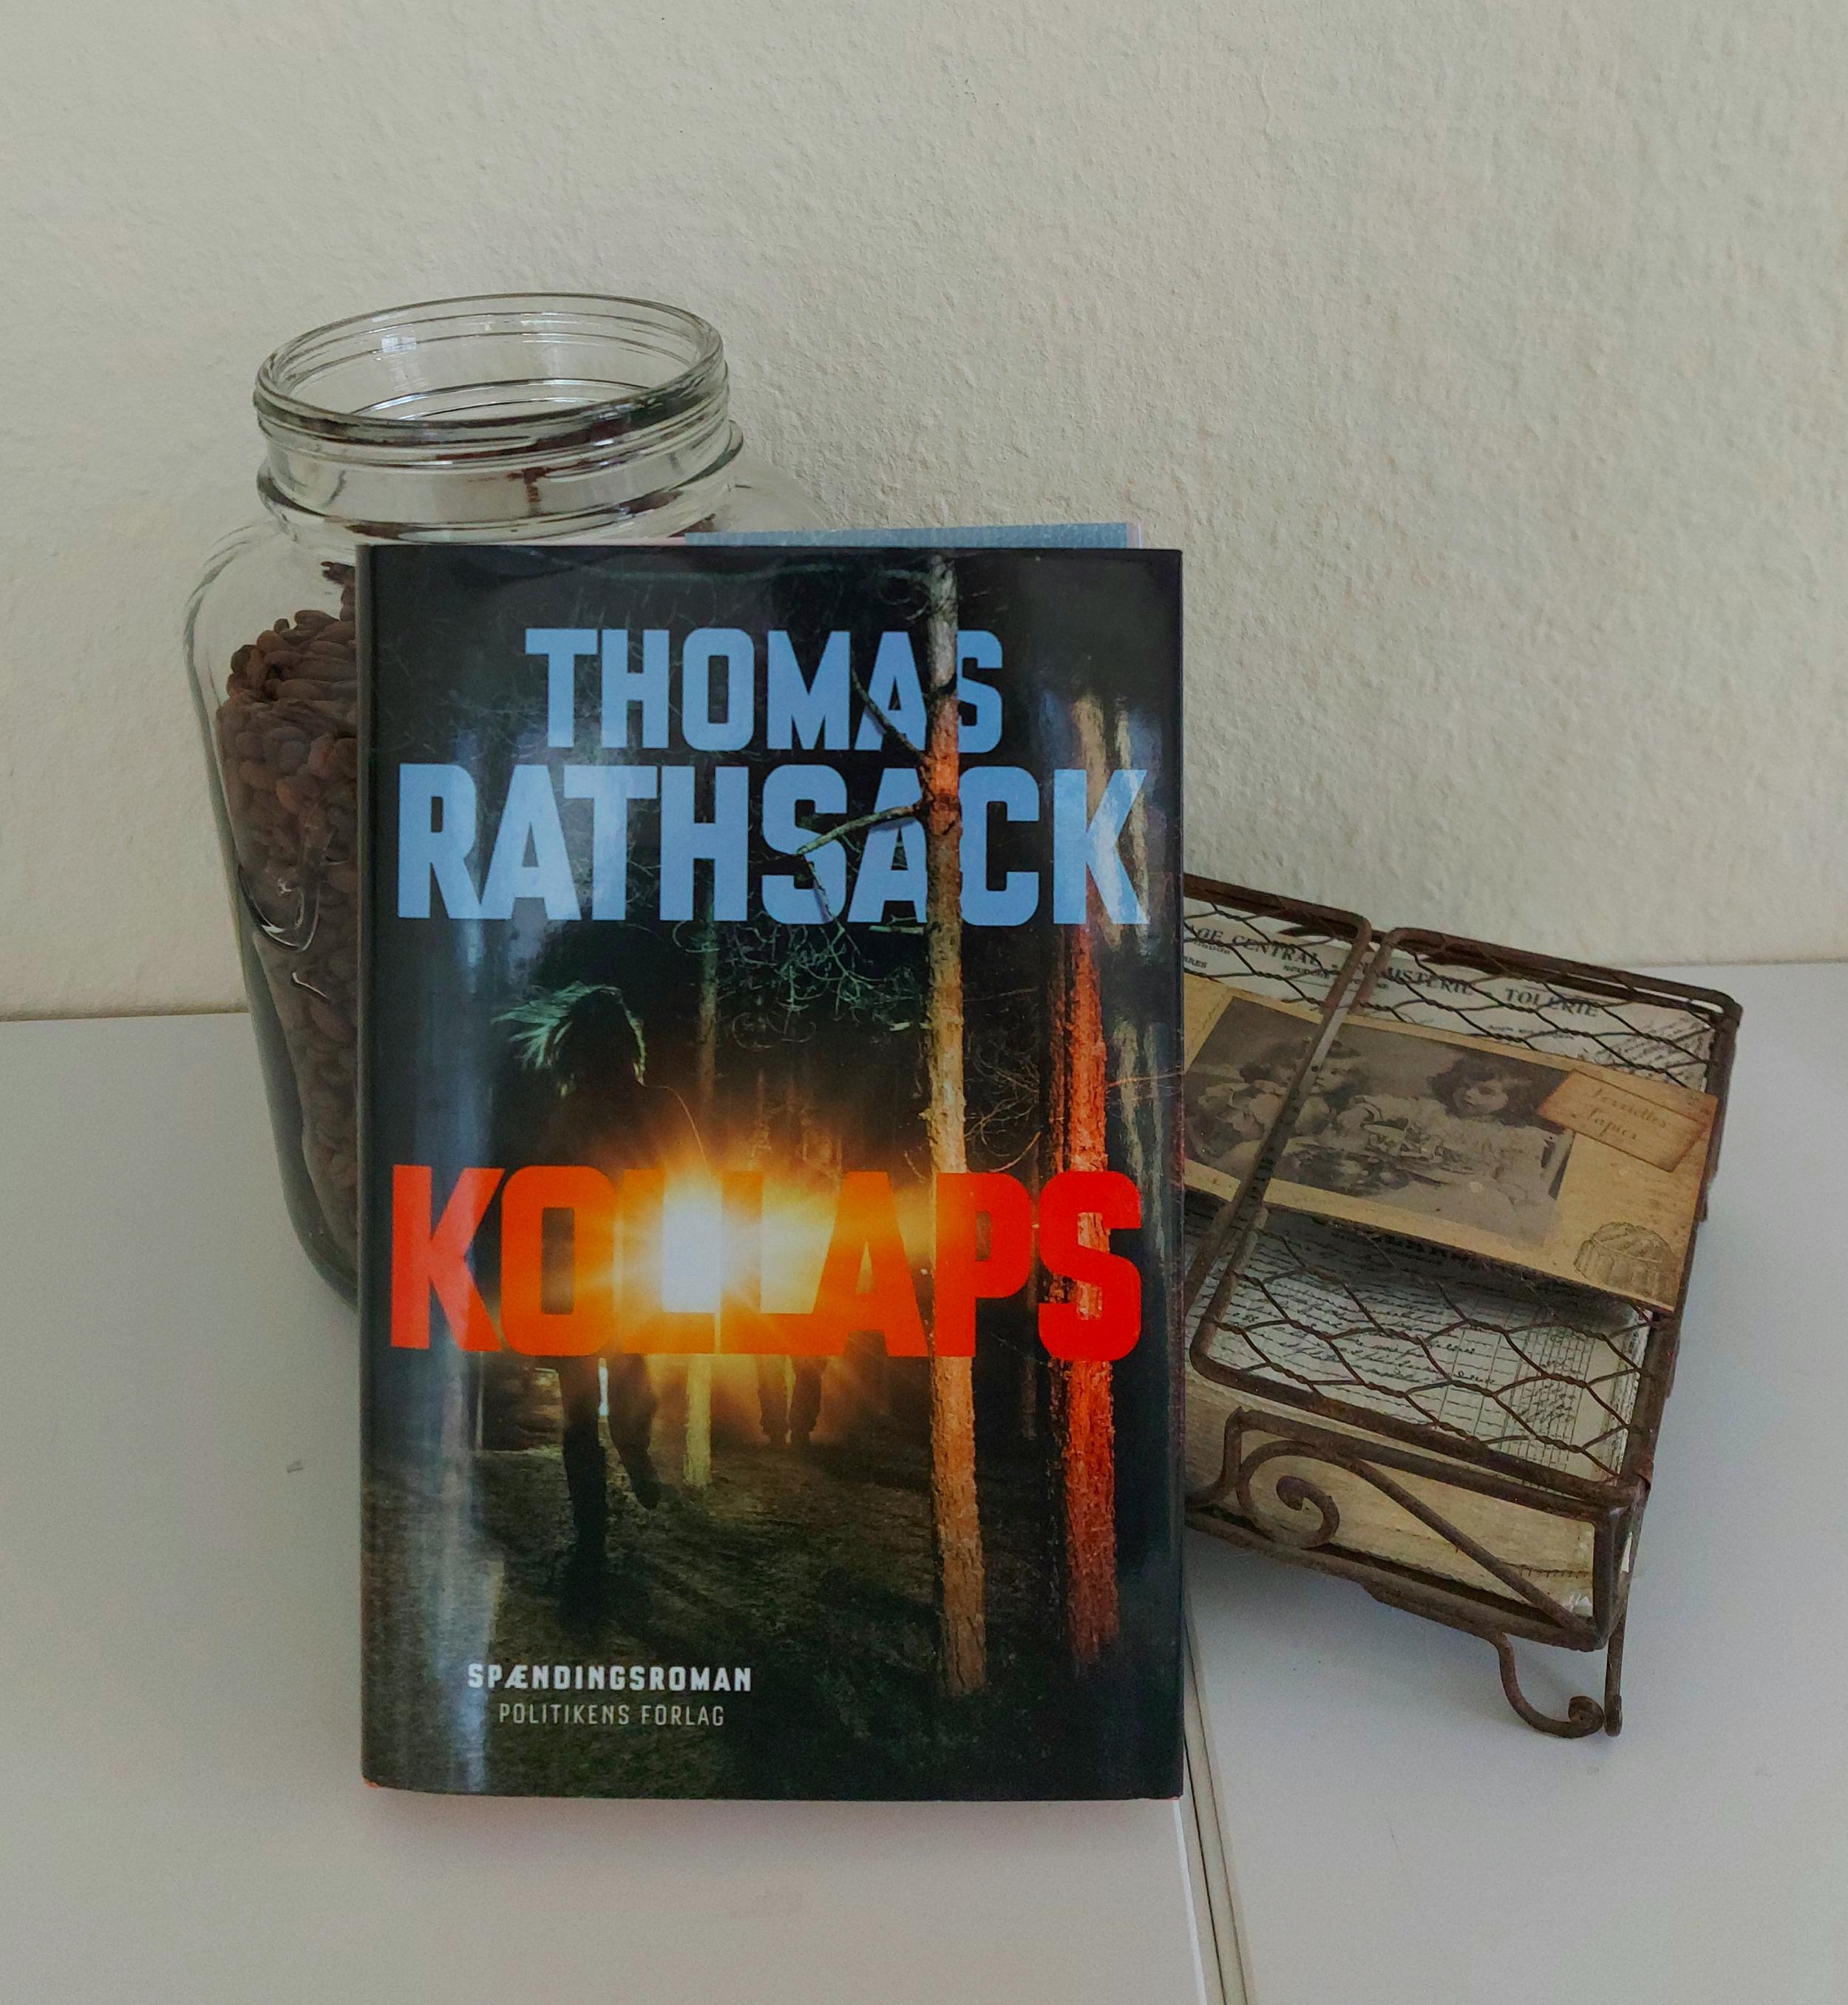 Kollaps af Thomas Rathsack (Plessner #5)